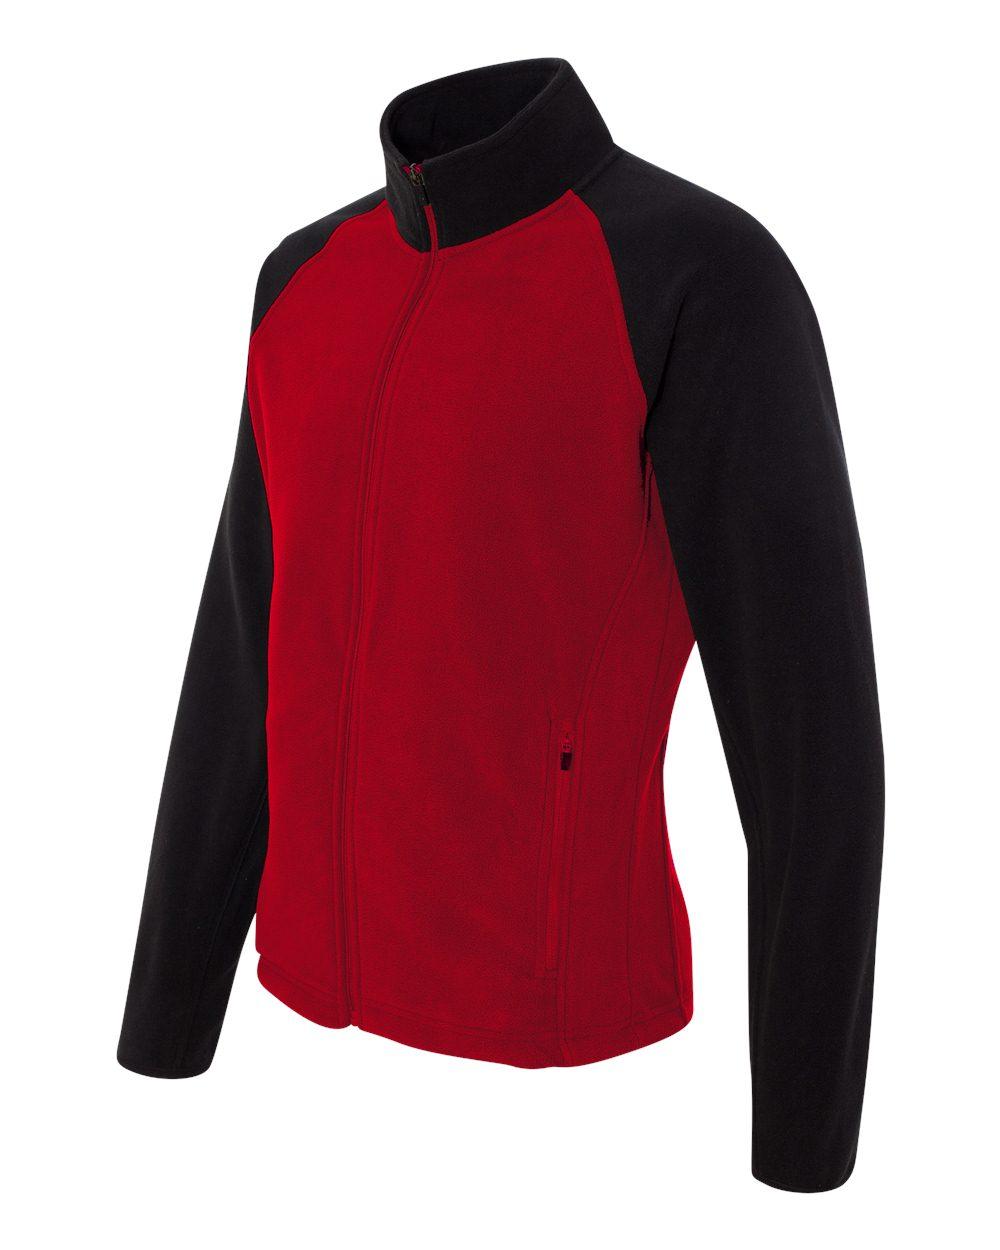 Colorado Clothing 7205 - Steamboat Microfleece Jacket